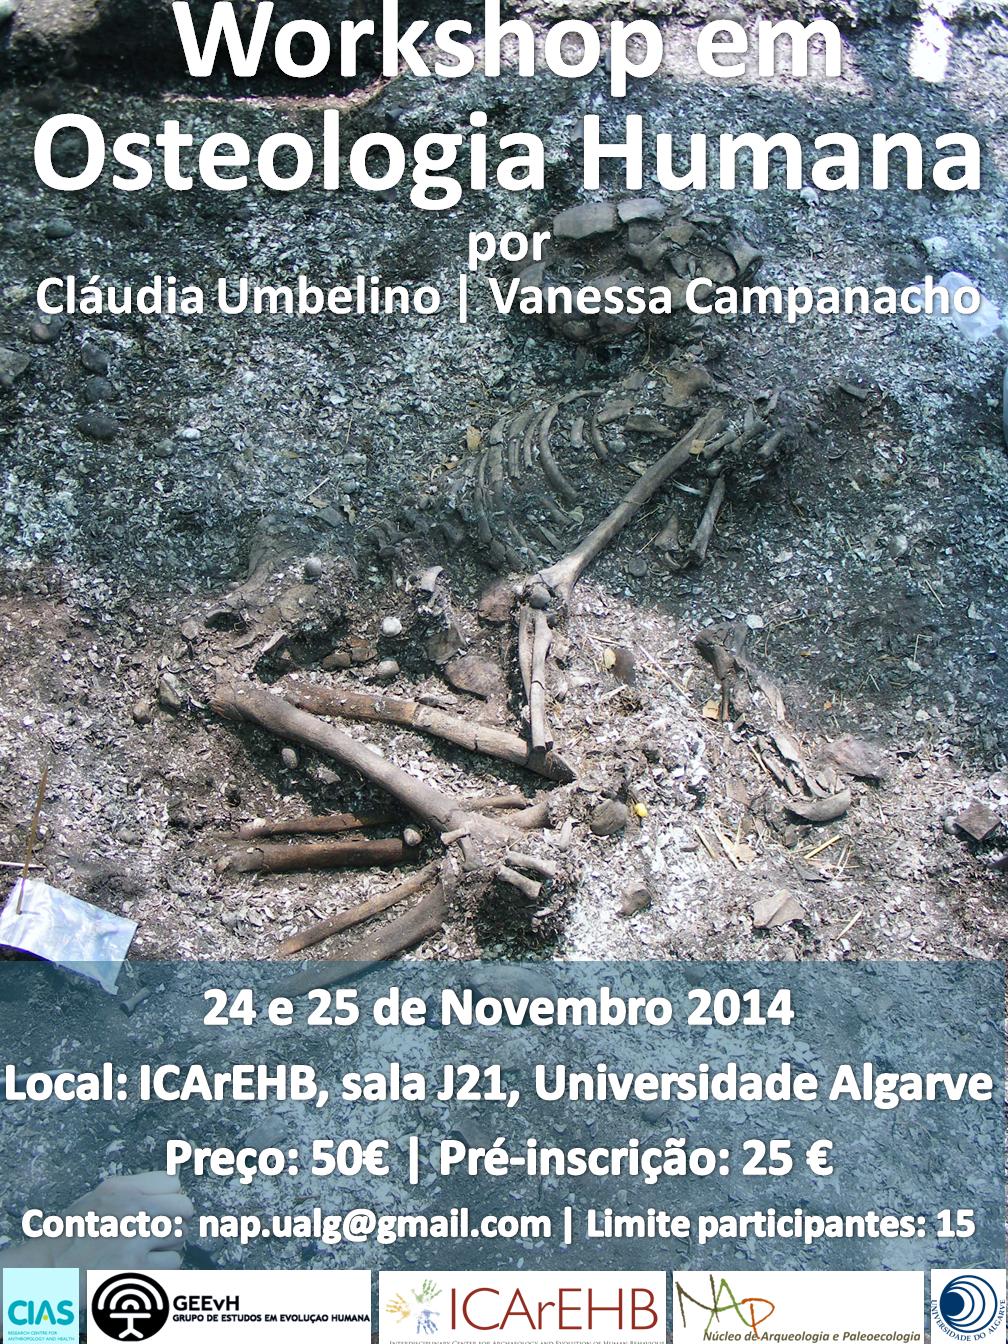 Workshop em Osteologia Humana